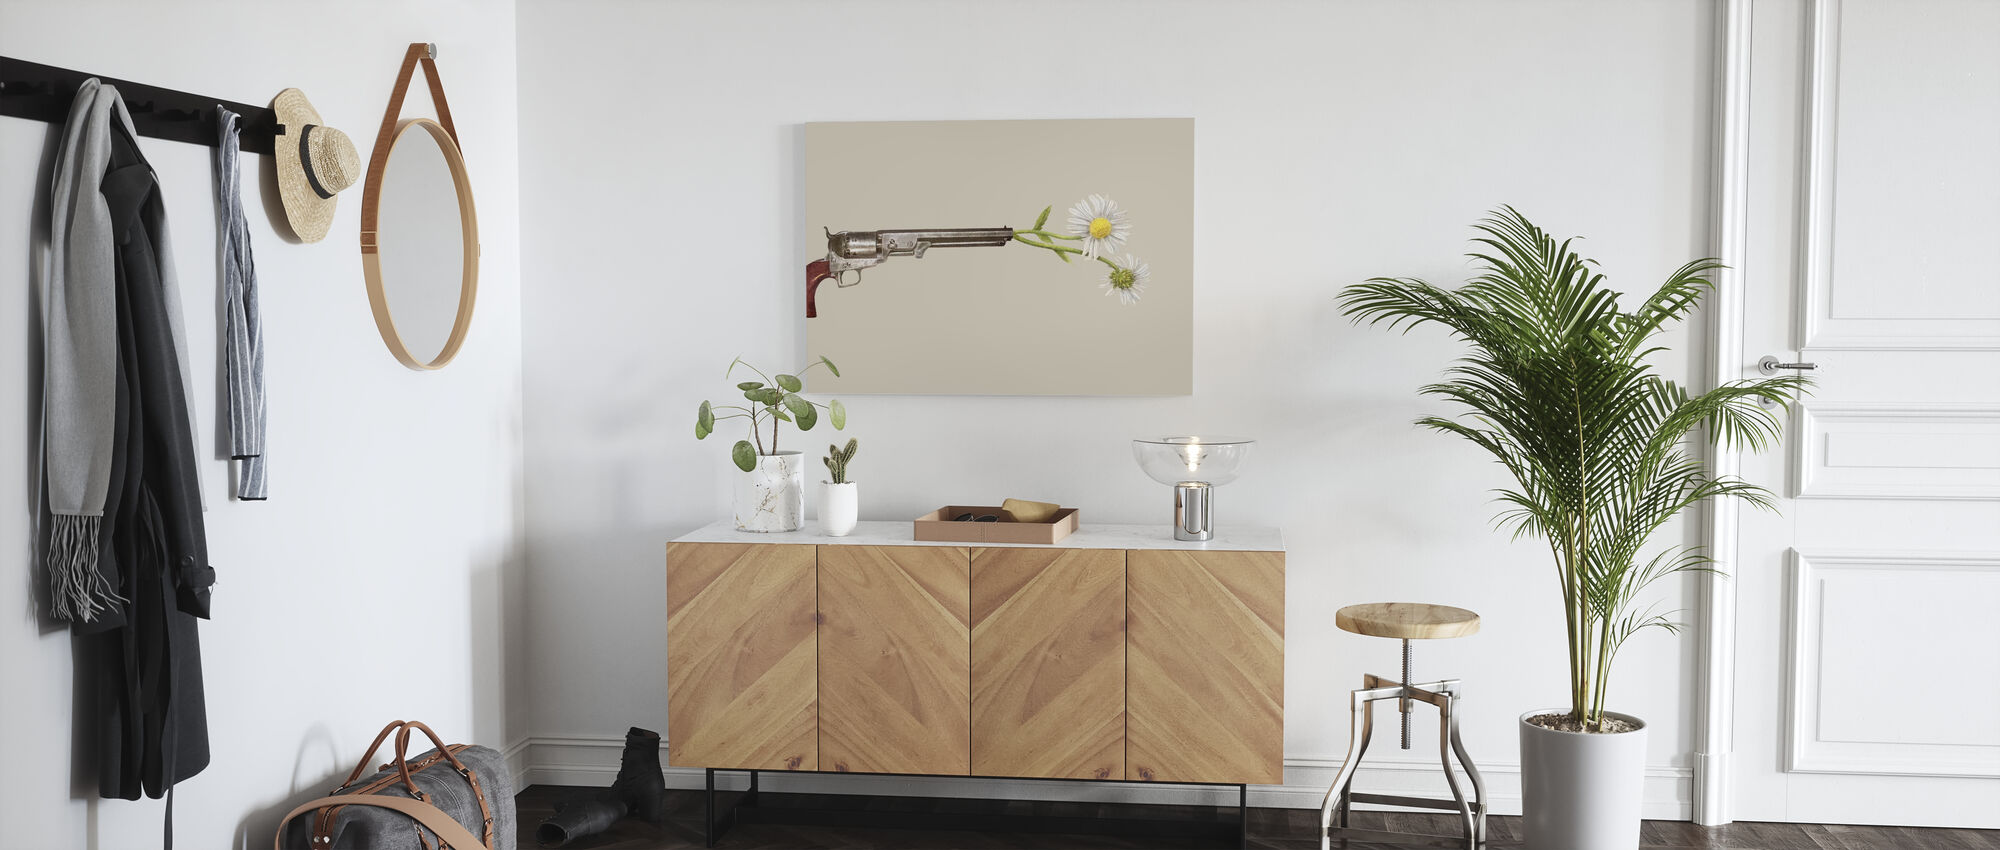 Peacemaker - Canvas print - Hallway